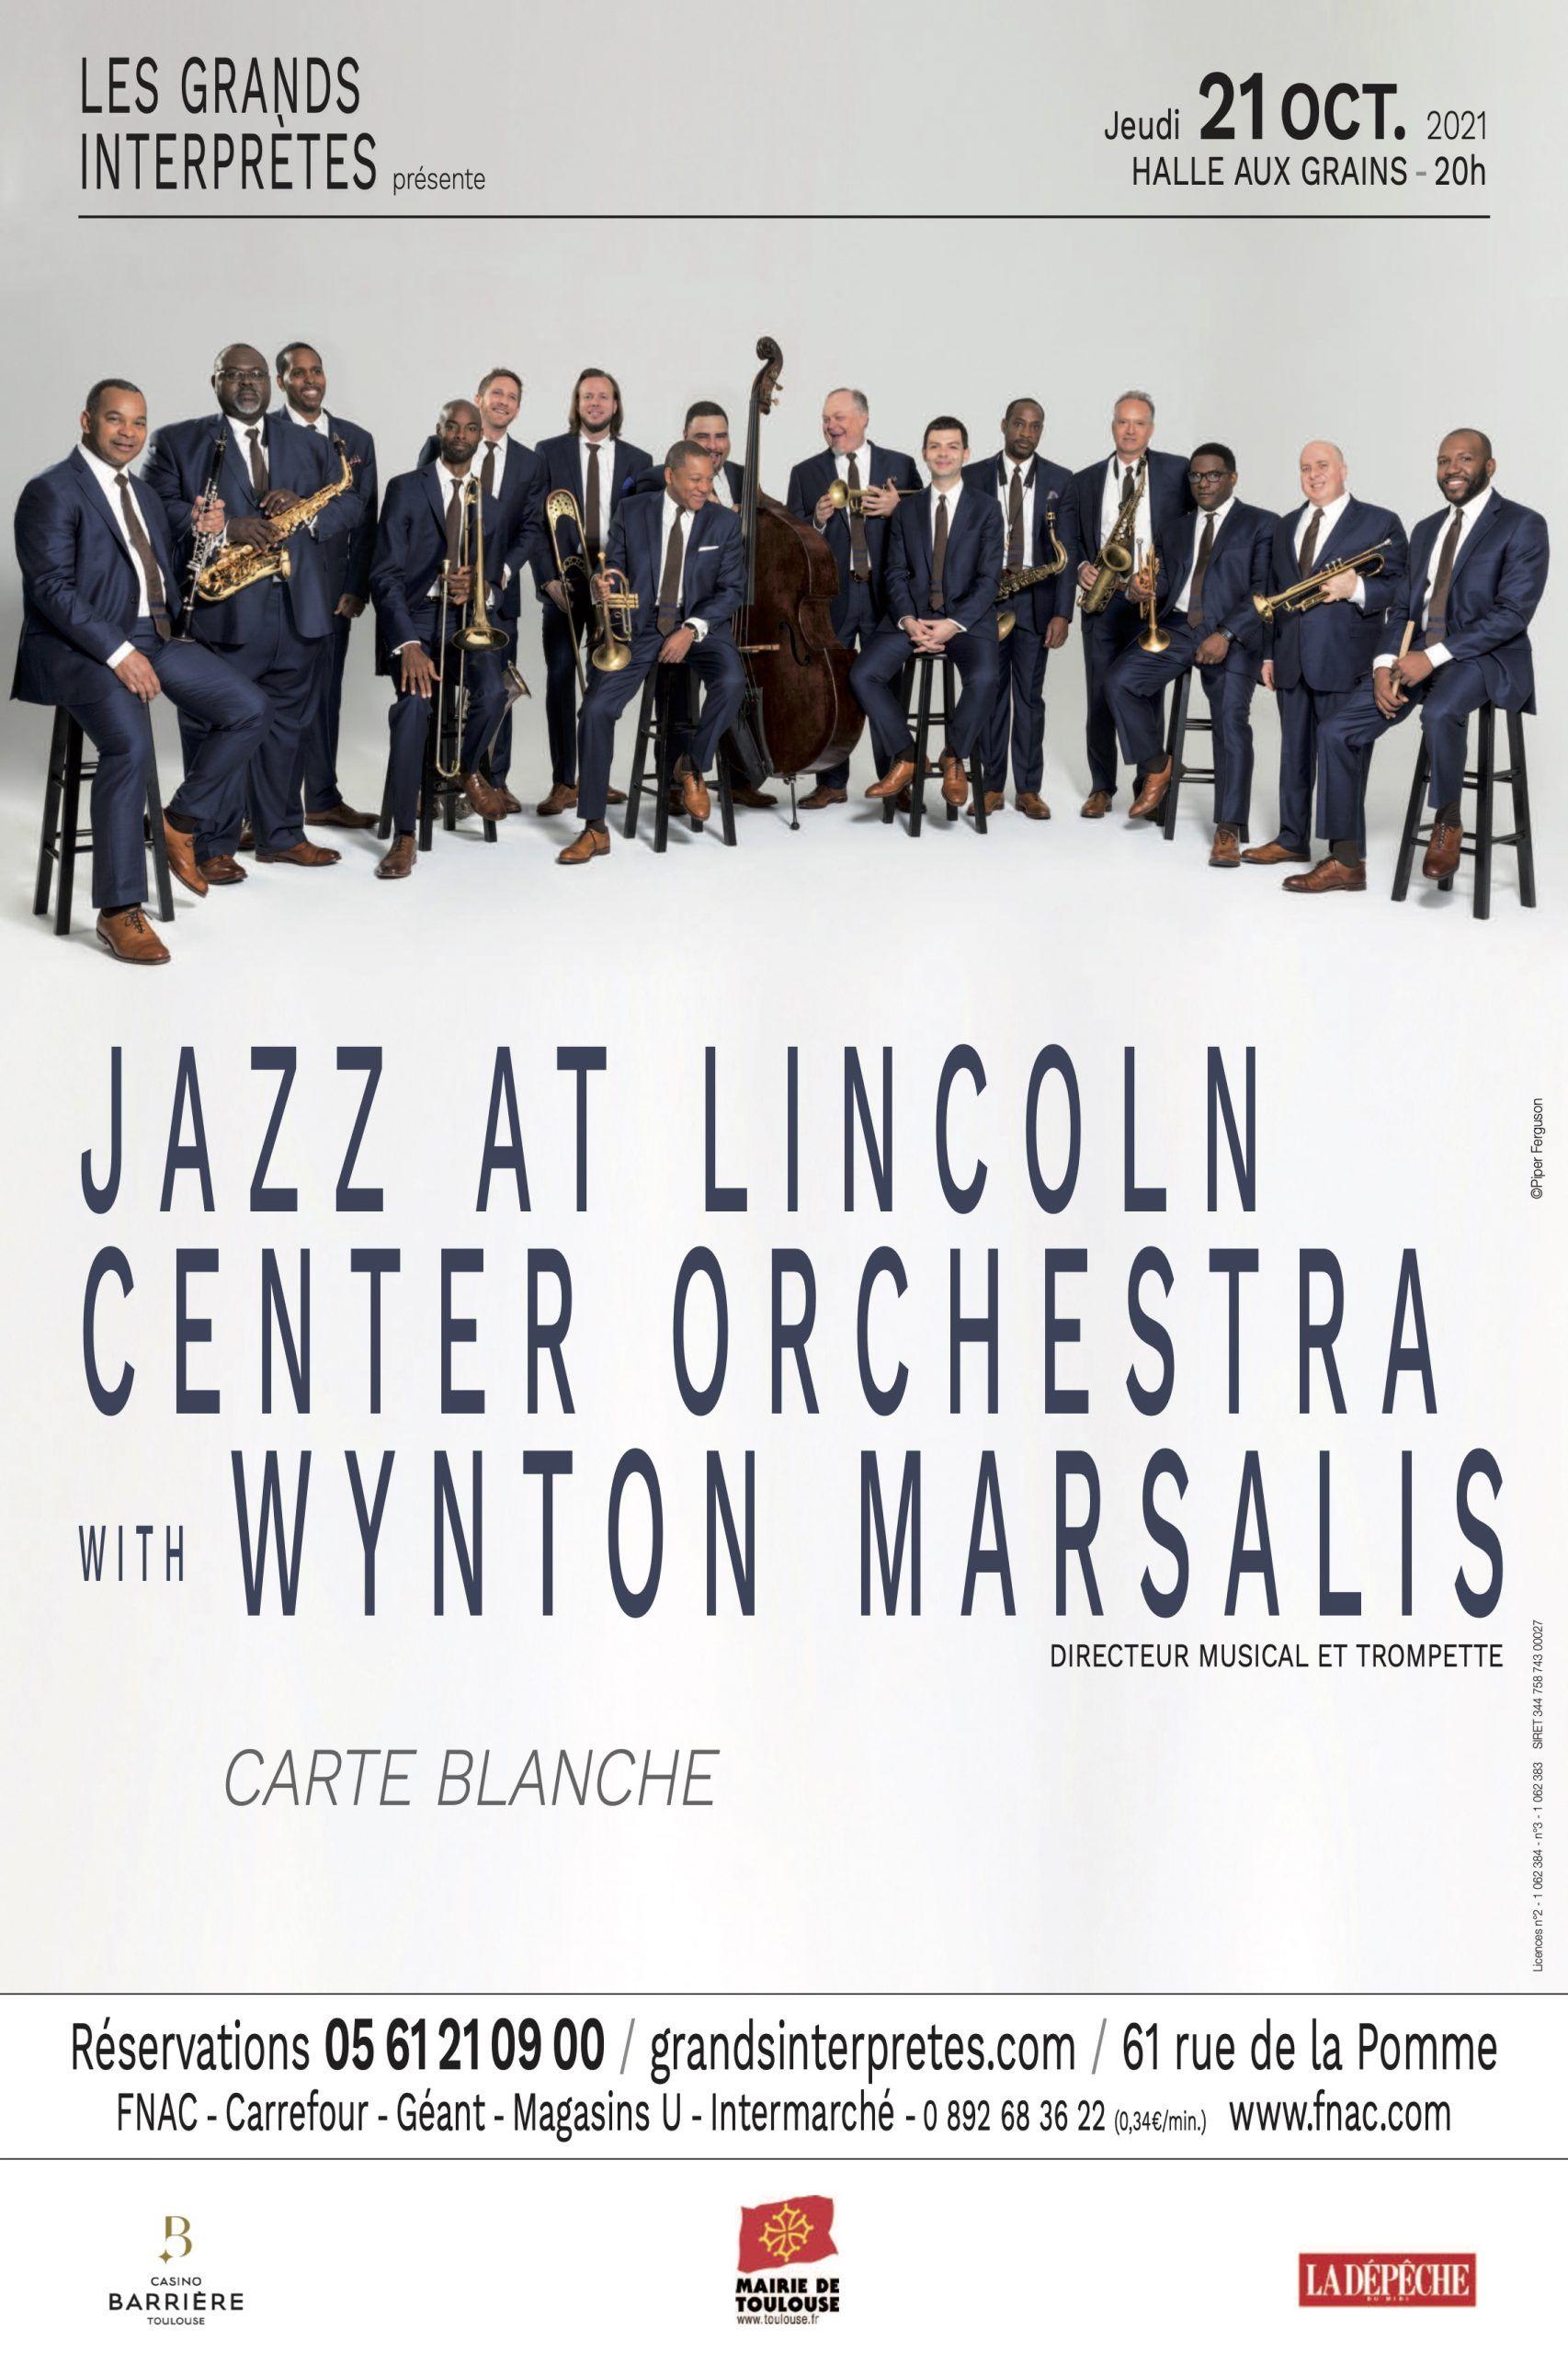 Les Grands Interprètes - Jazz at Lincoln With Wynton Marsalis